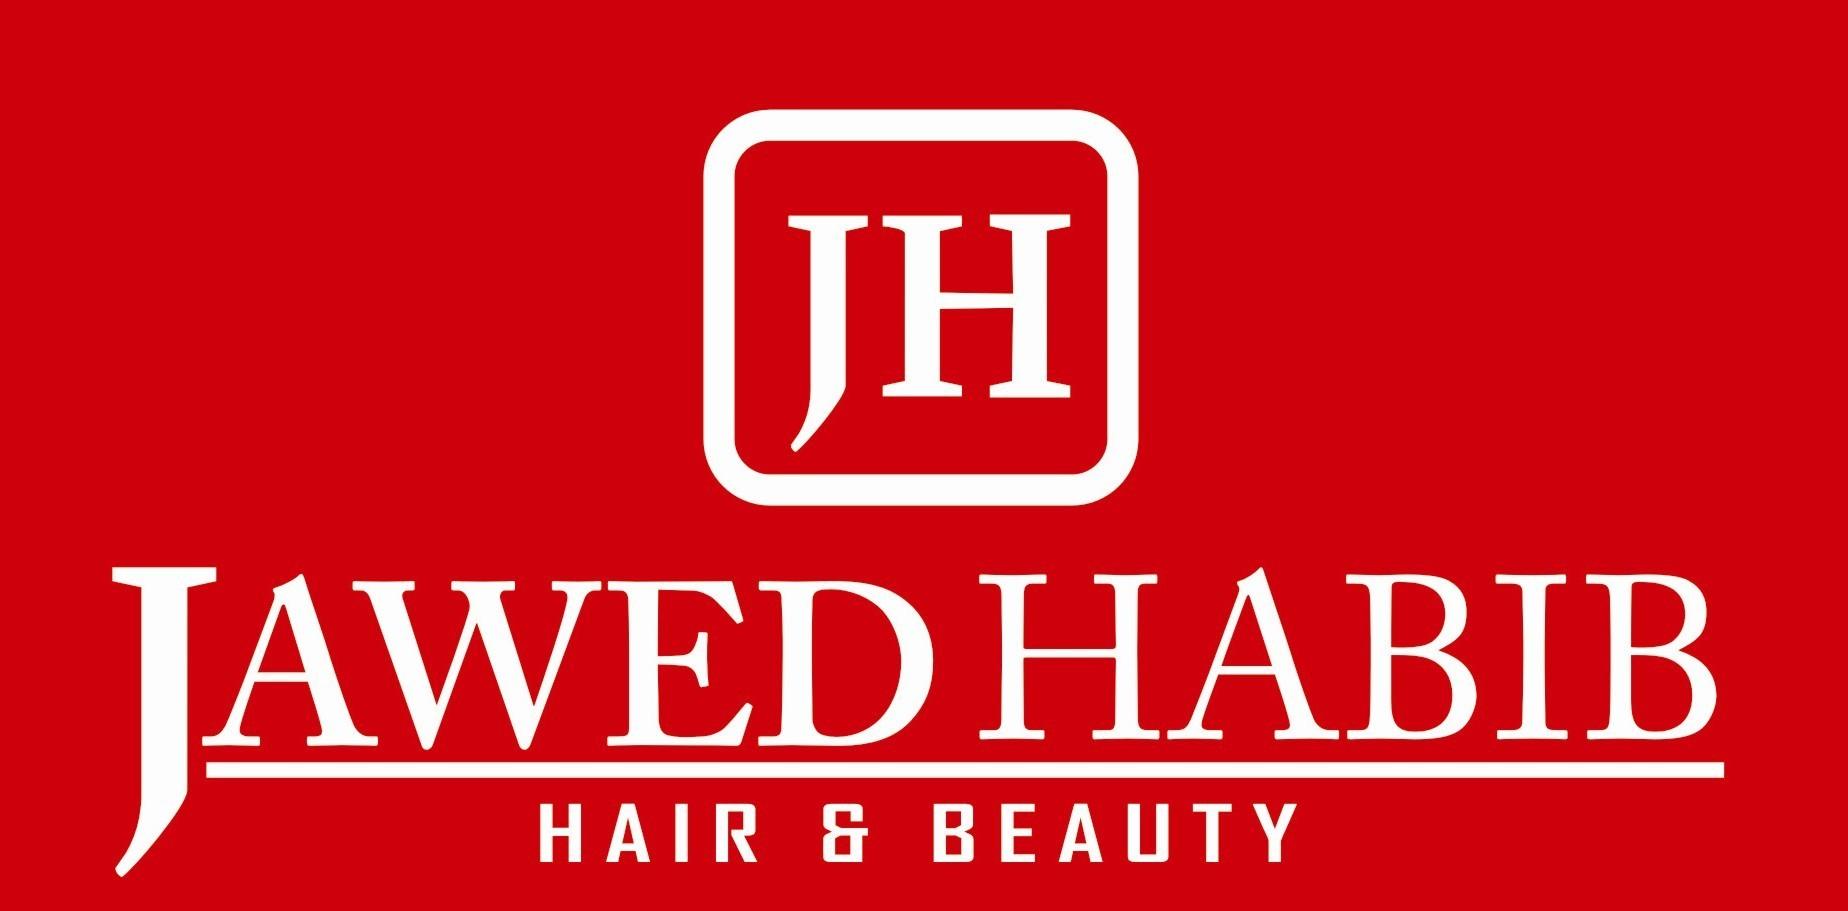 Jawed Habib Hair & Beauty Salons - Police Bazar - Shillong Image